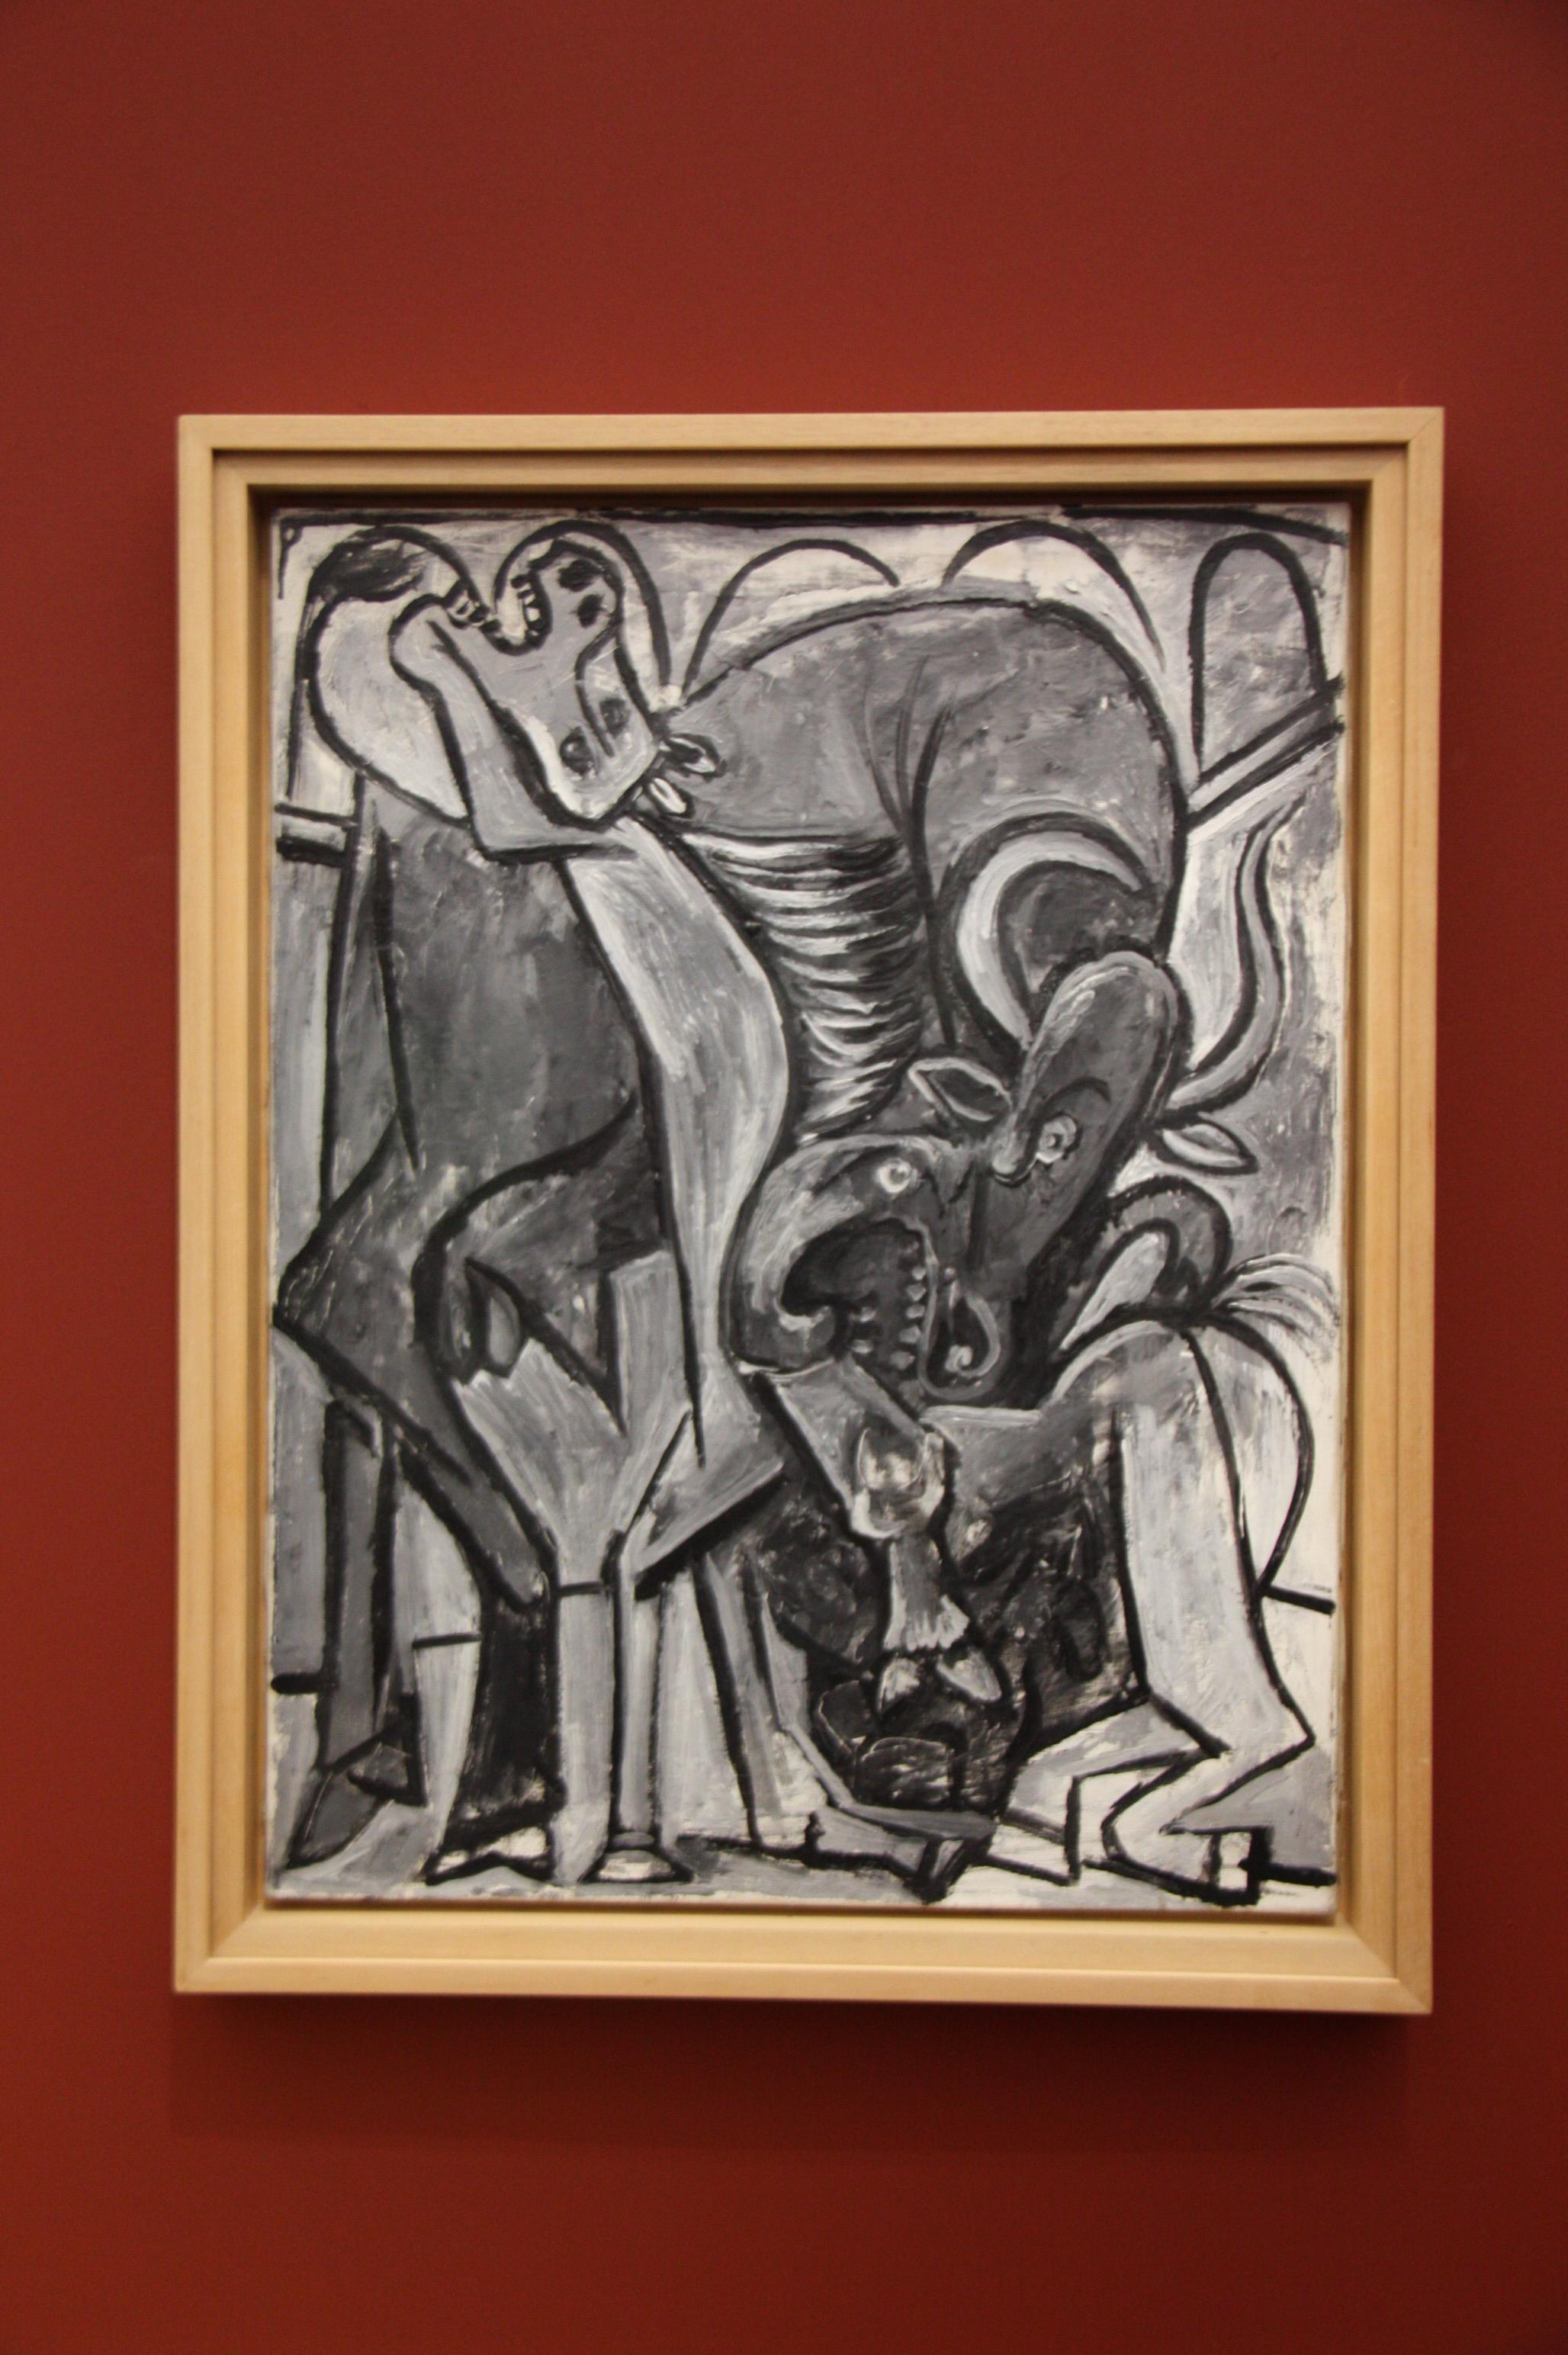 Pablo Picasso, cheval et taureau, 1934, exposition-leiris-centre-pompidou-metz